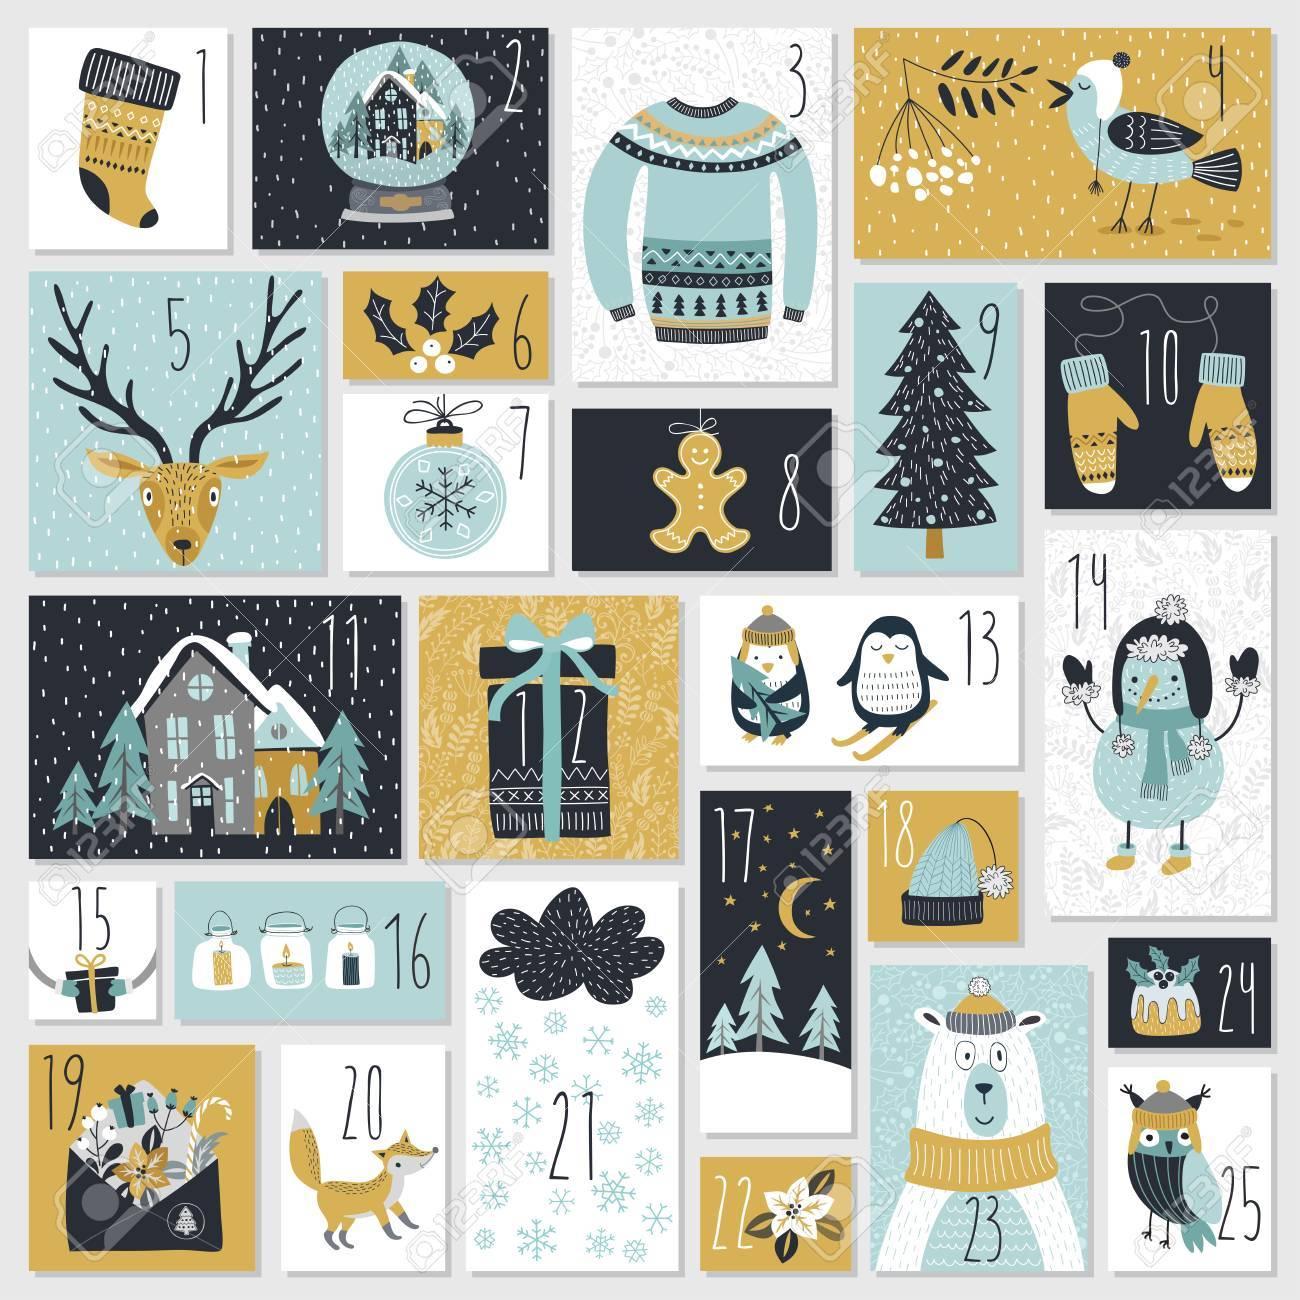 Christmas advent calendar, hand drawn style. Vector illustration. - 67582707